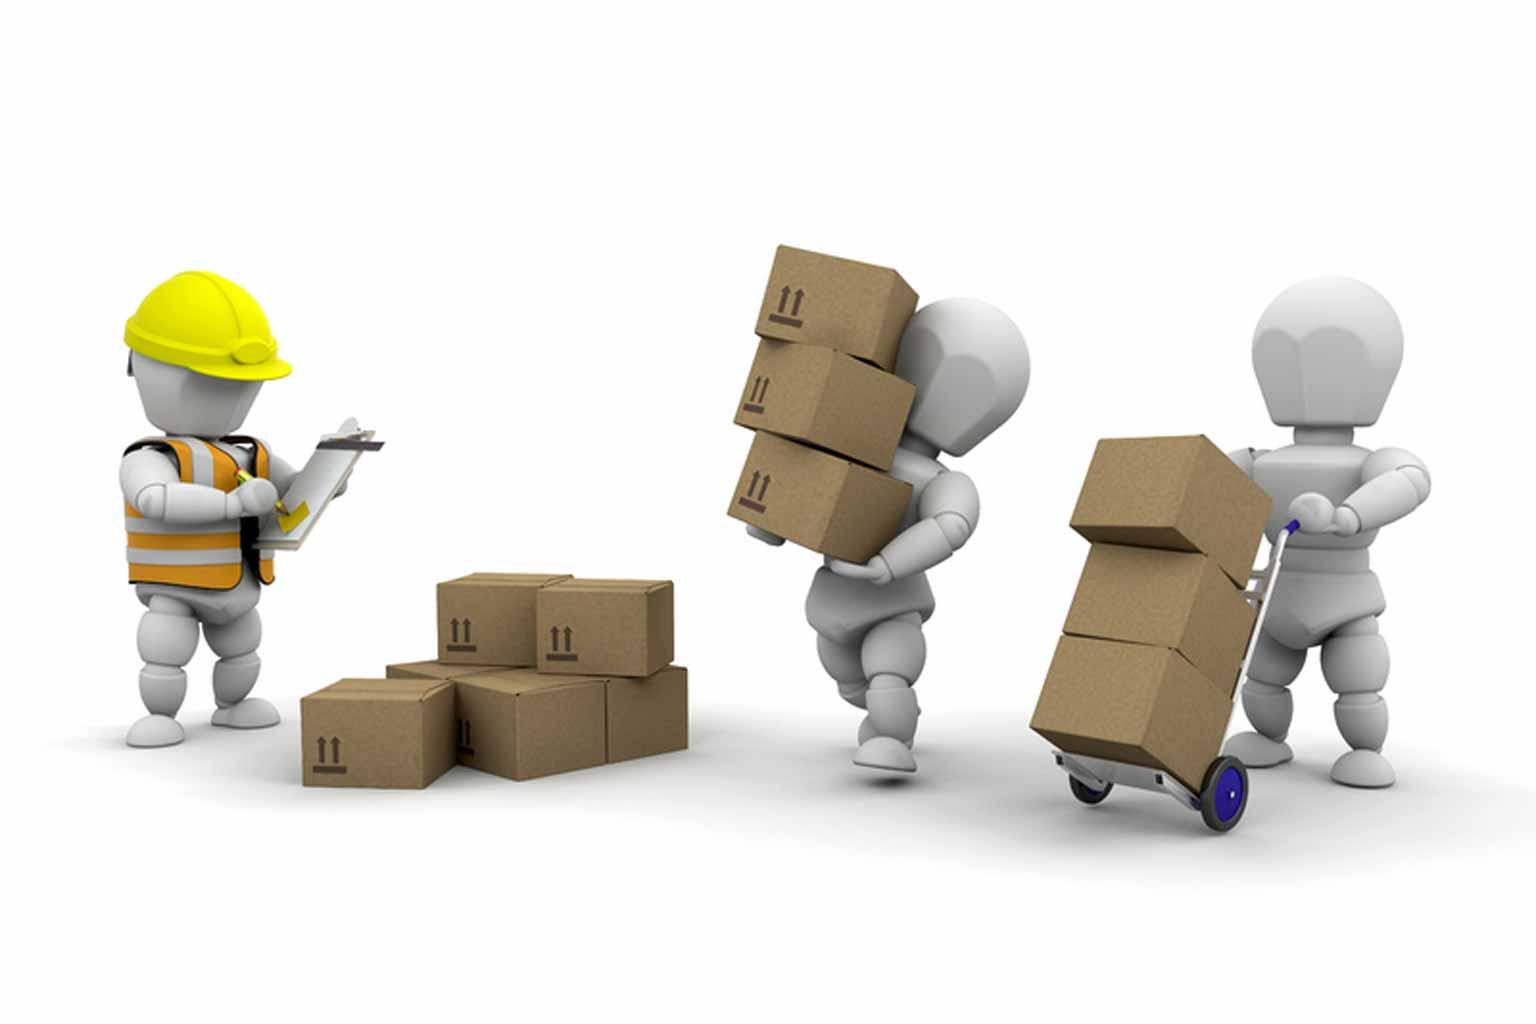 comercioyadunas carga y tipos operators manual terex demag ac160-5 operators manuals free